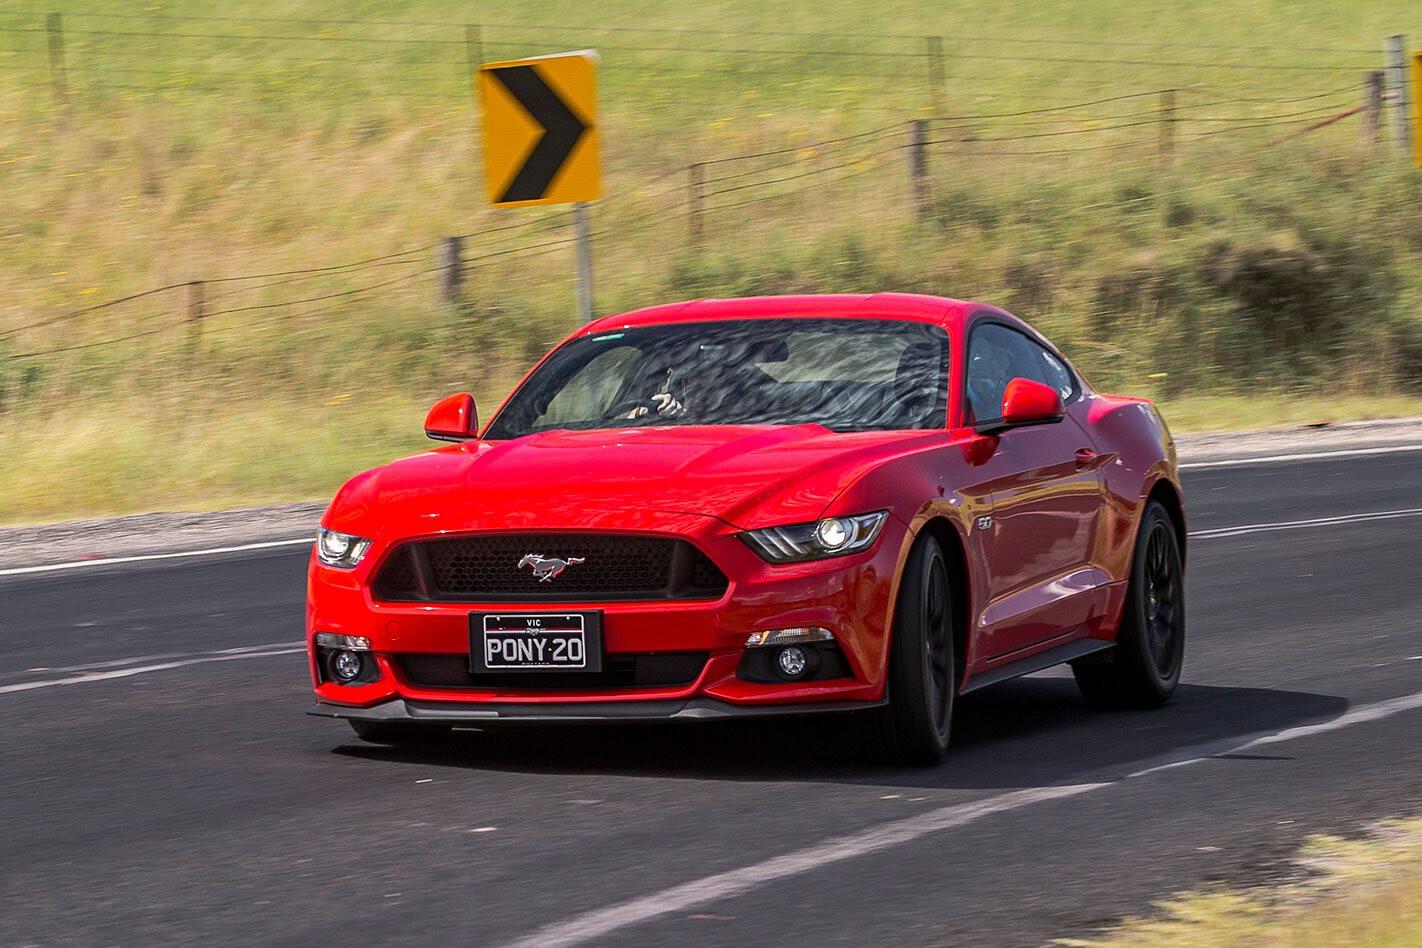 Ford Mustang Gt 2016 Drive Attitude Jpg